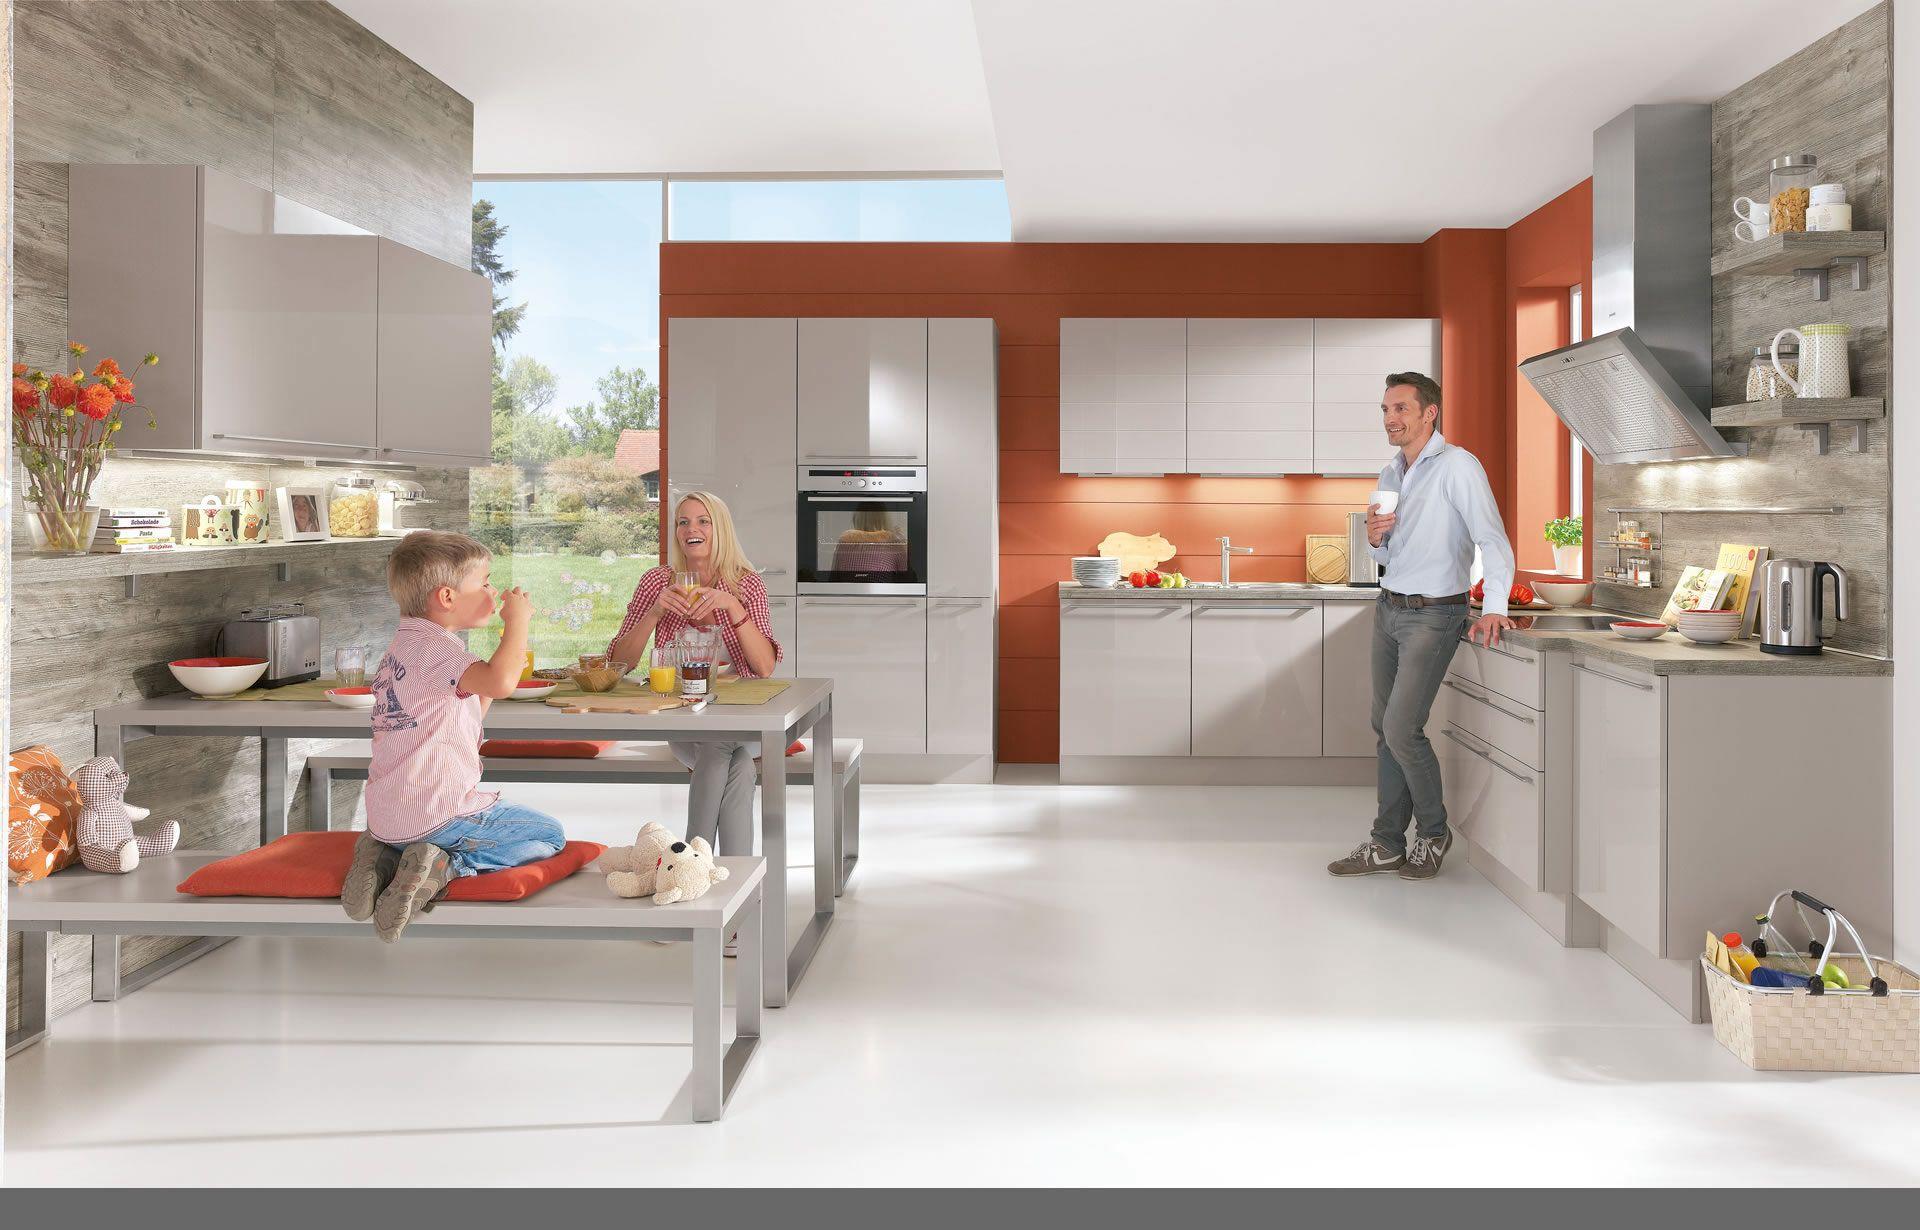 Explore Modern Kitchens, Kitchen Ideas, And More! Nobilia Küchen ...